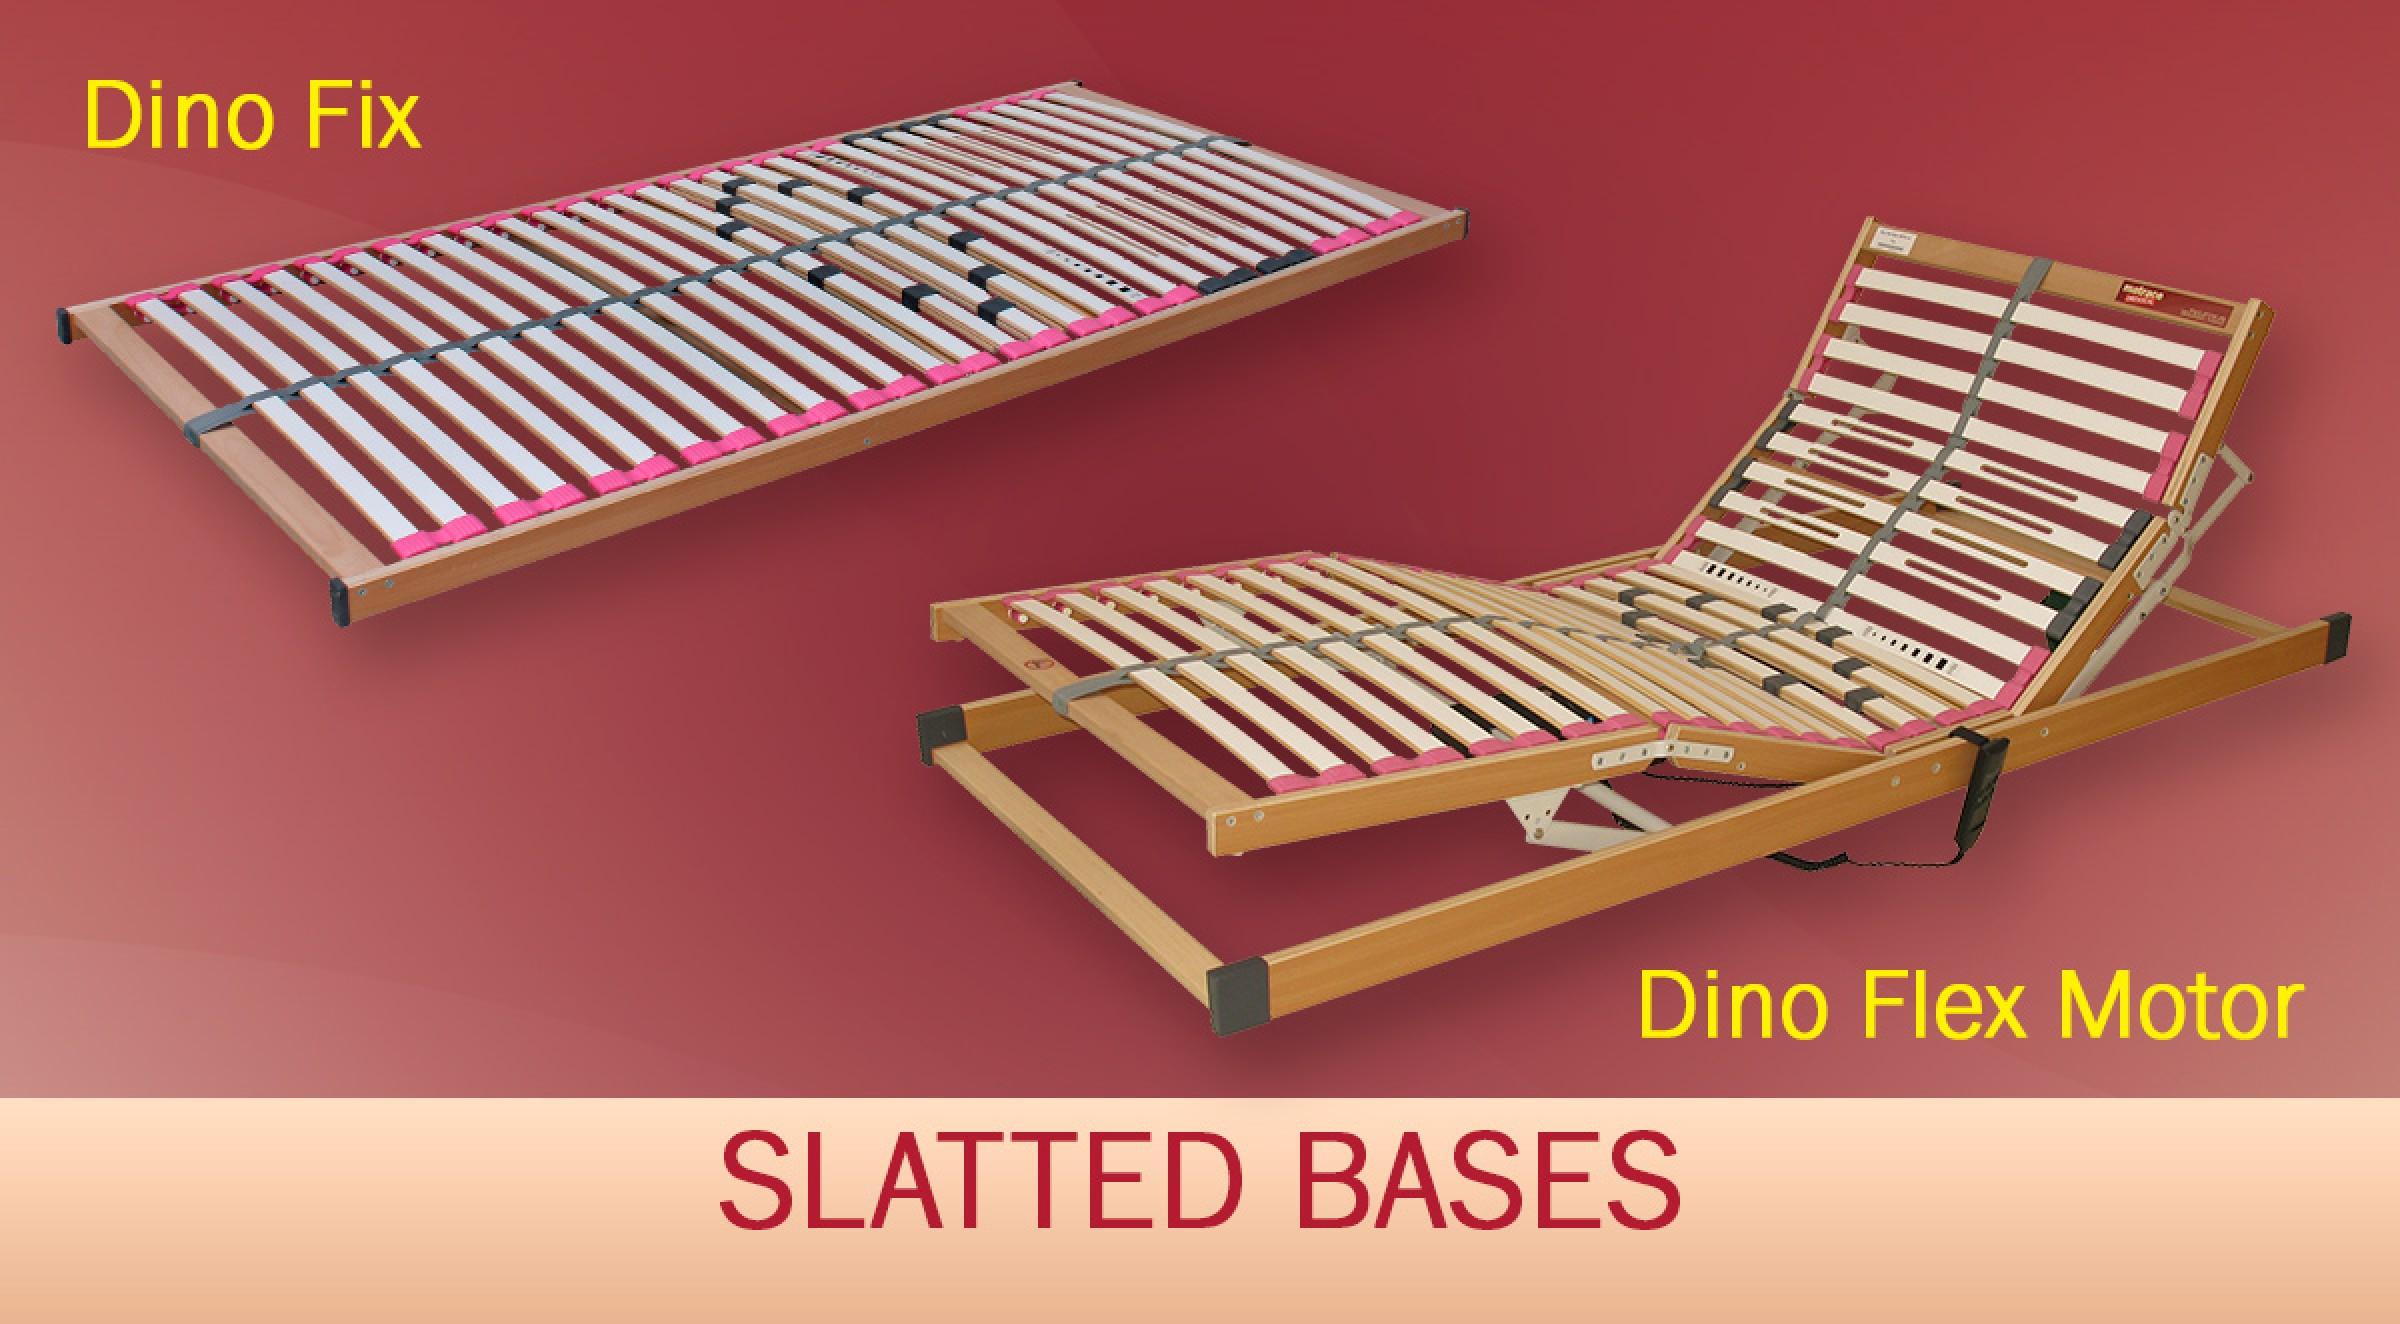 Slatted bases